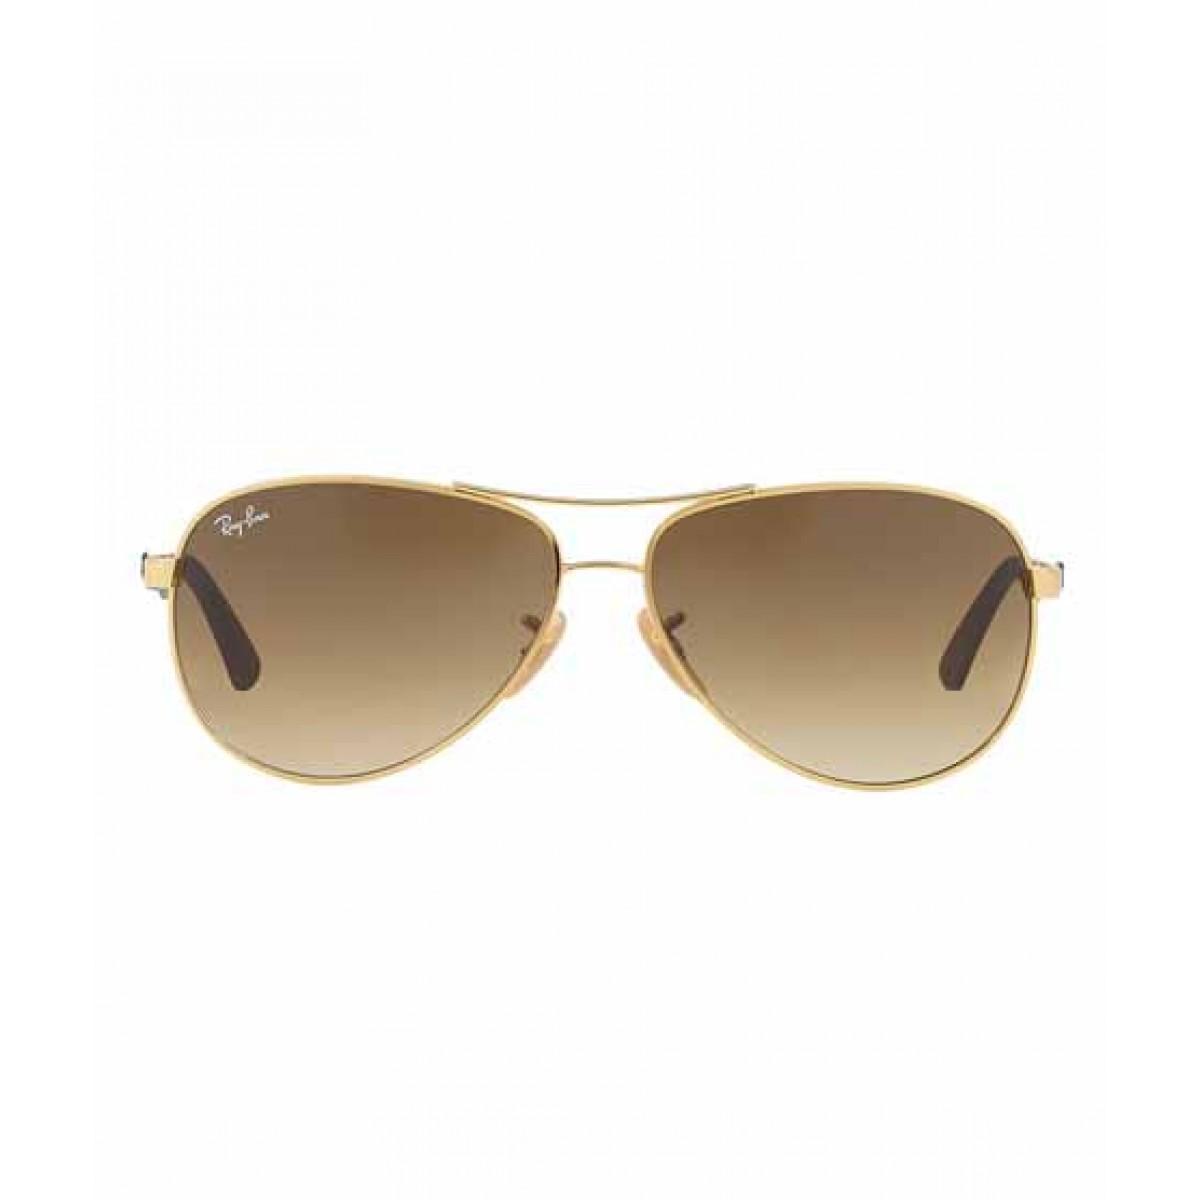 c450db6253c94 RayBan Sunglasses Price in Pakistan